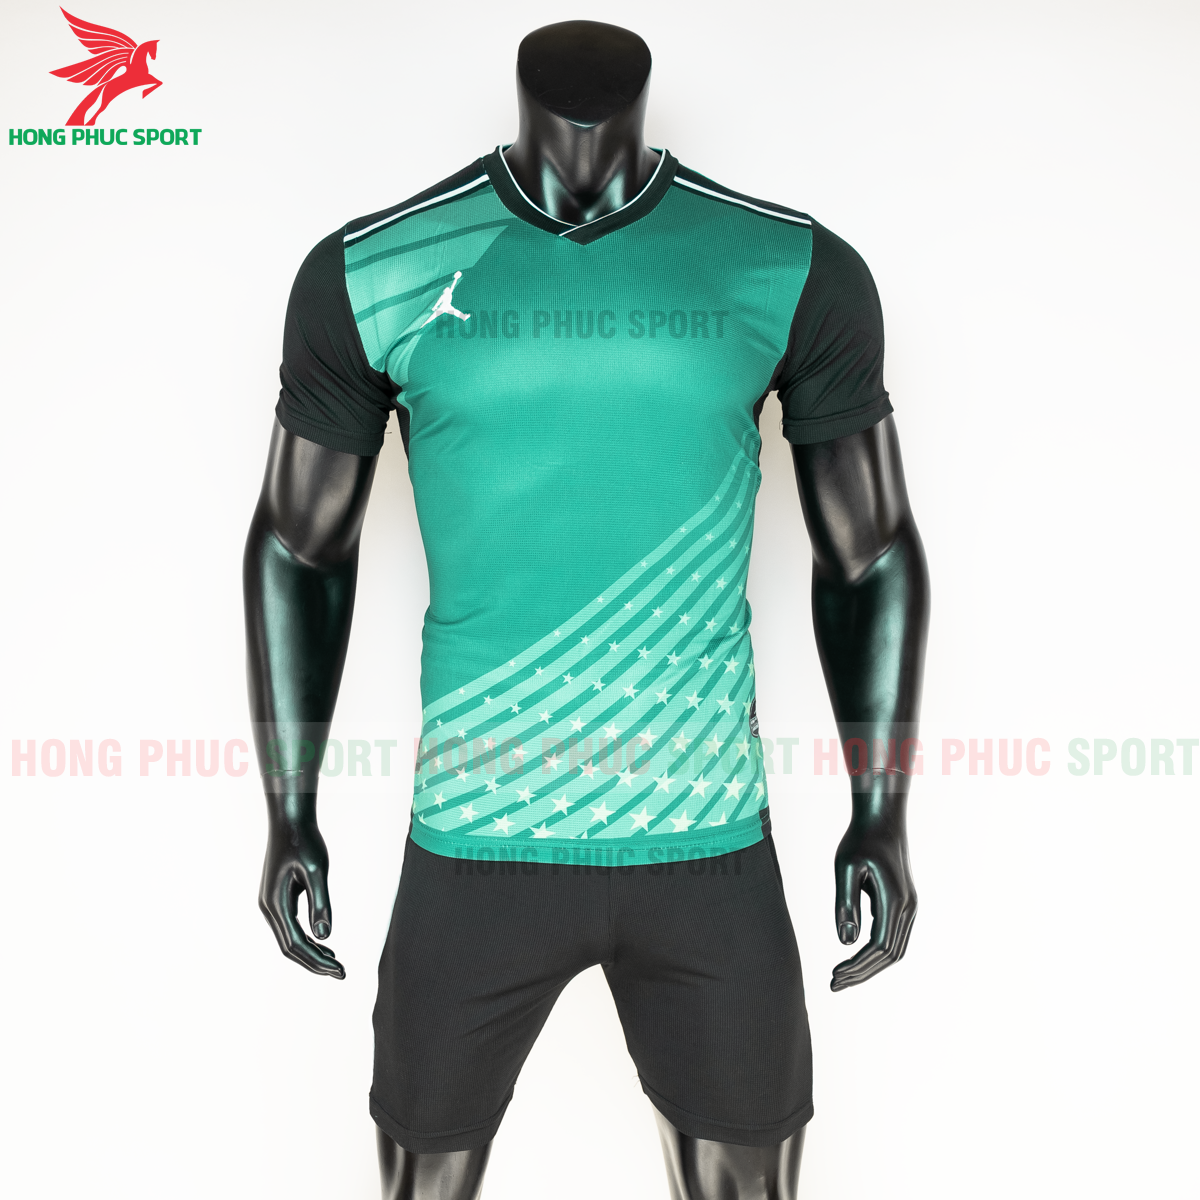 https://cdn.hongphucsport.com/unsafe/s4.shopbay.vn/files/285/ao-bong-chuyen-jordan-20-21-hang-det-mau3-2-5faf43bc5155a.png